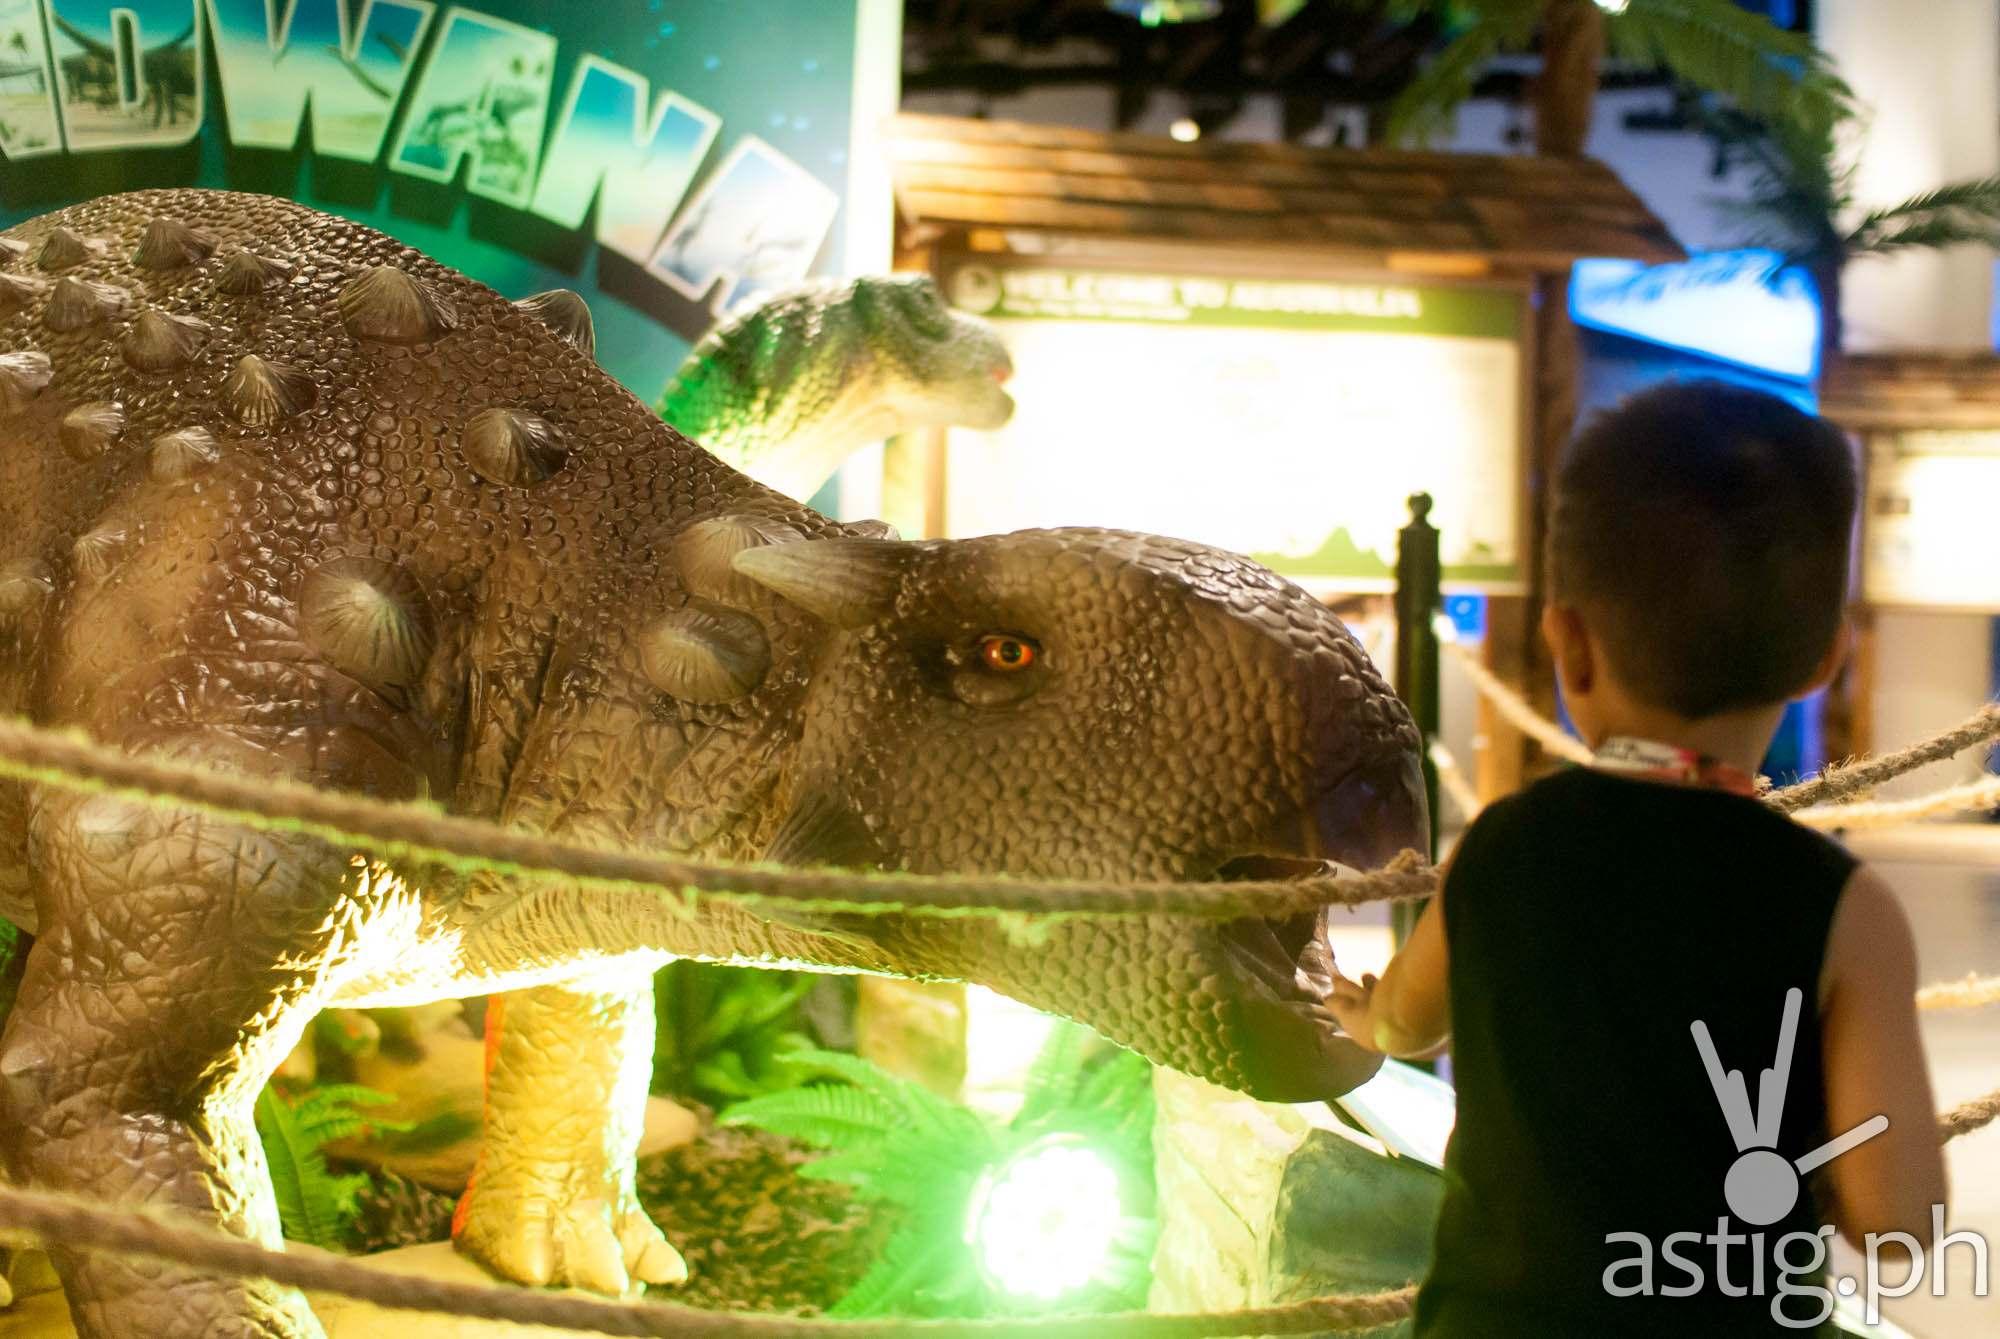 Kid touching animatronic dinosaur -Dinosaurs Around The World exhibit - Mind Museum BGC